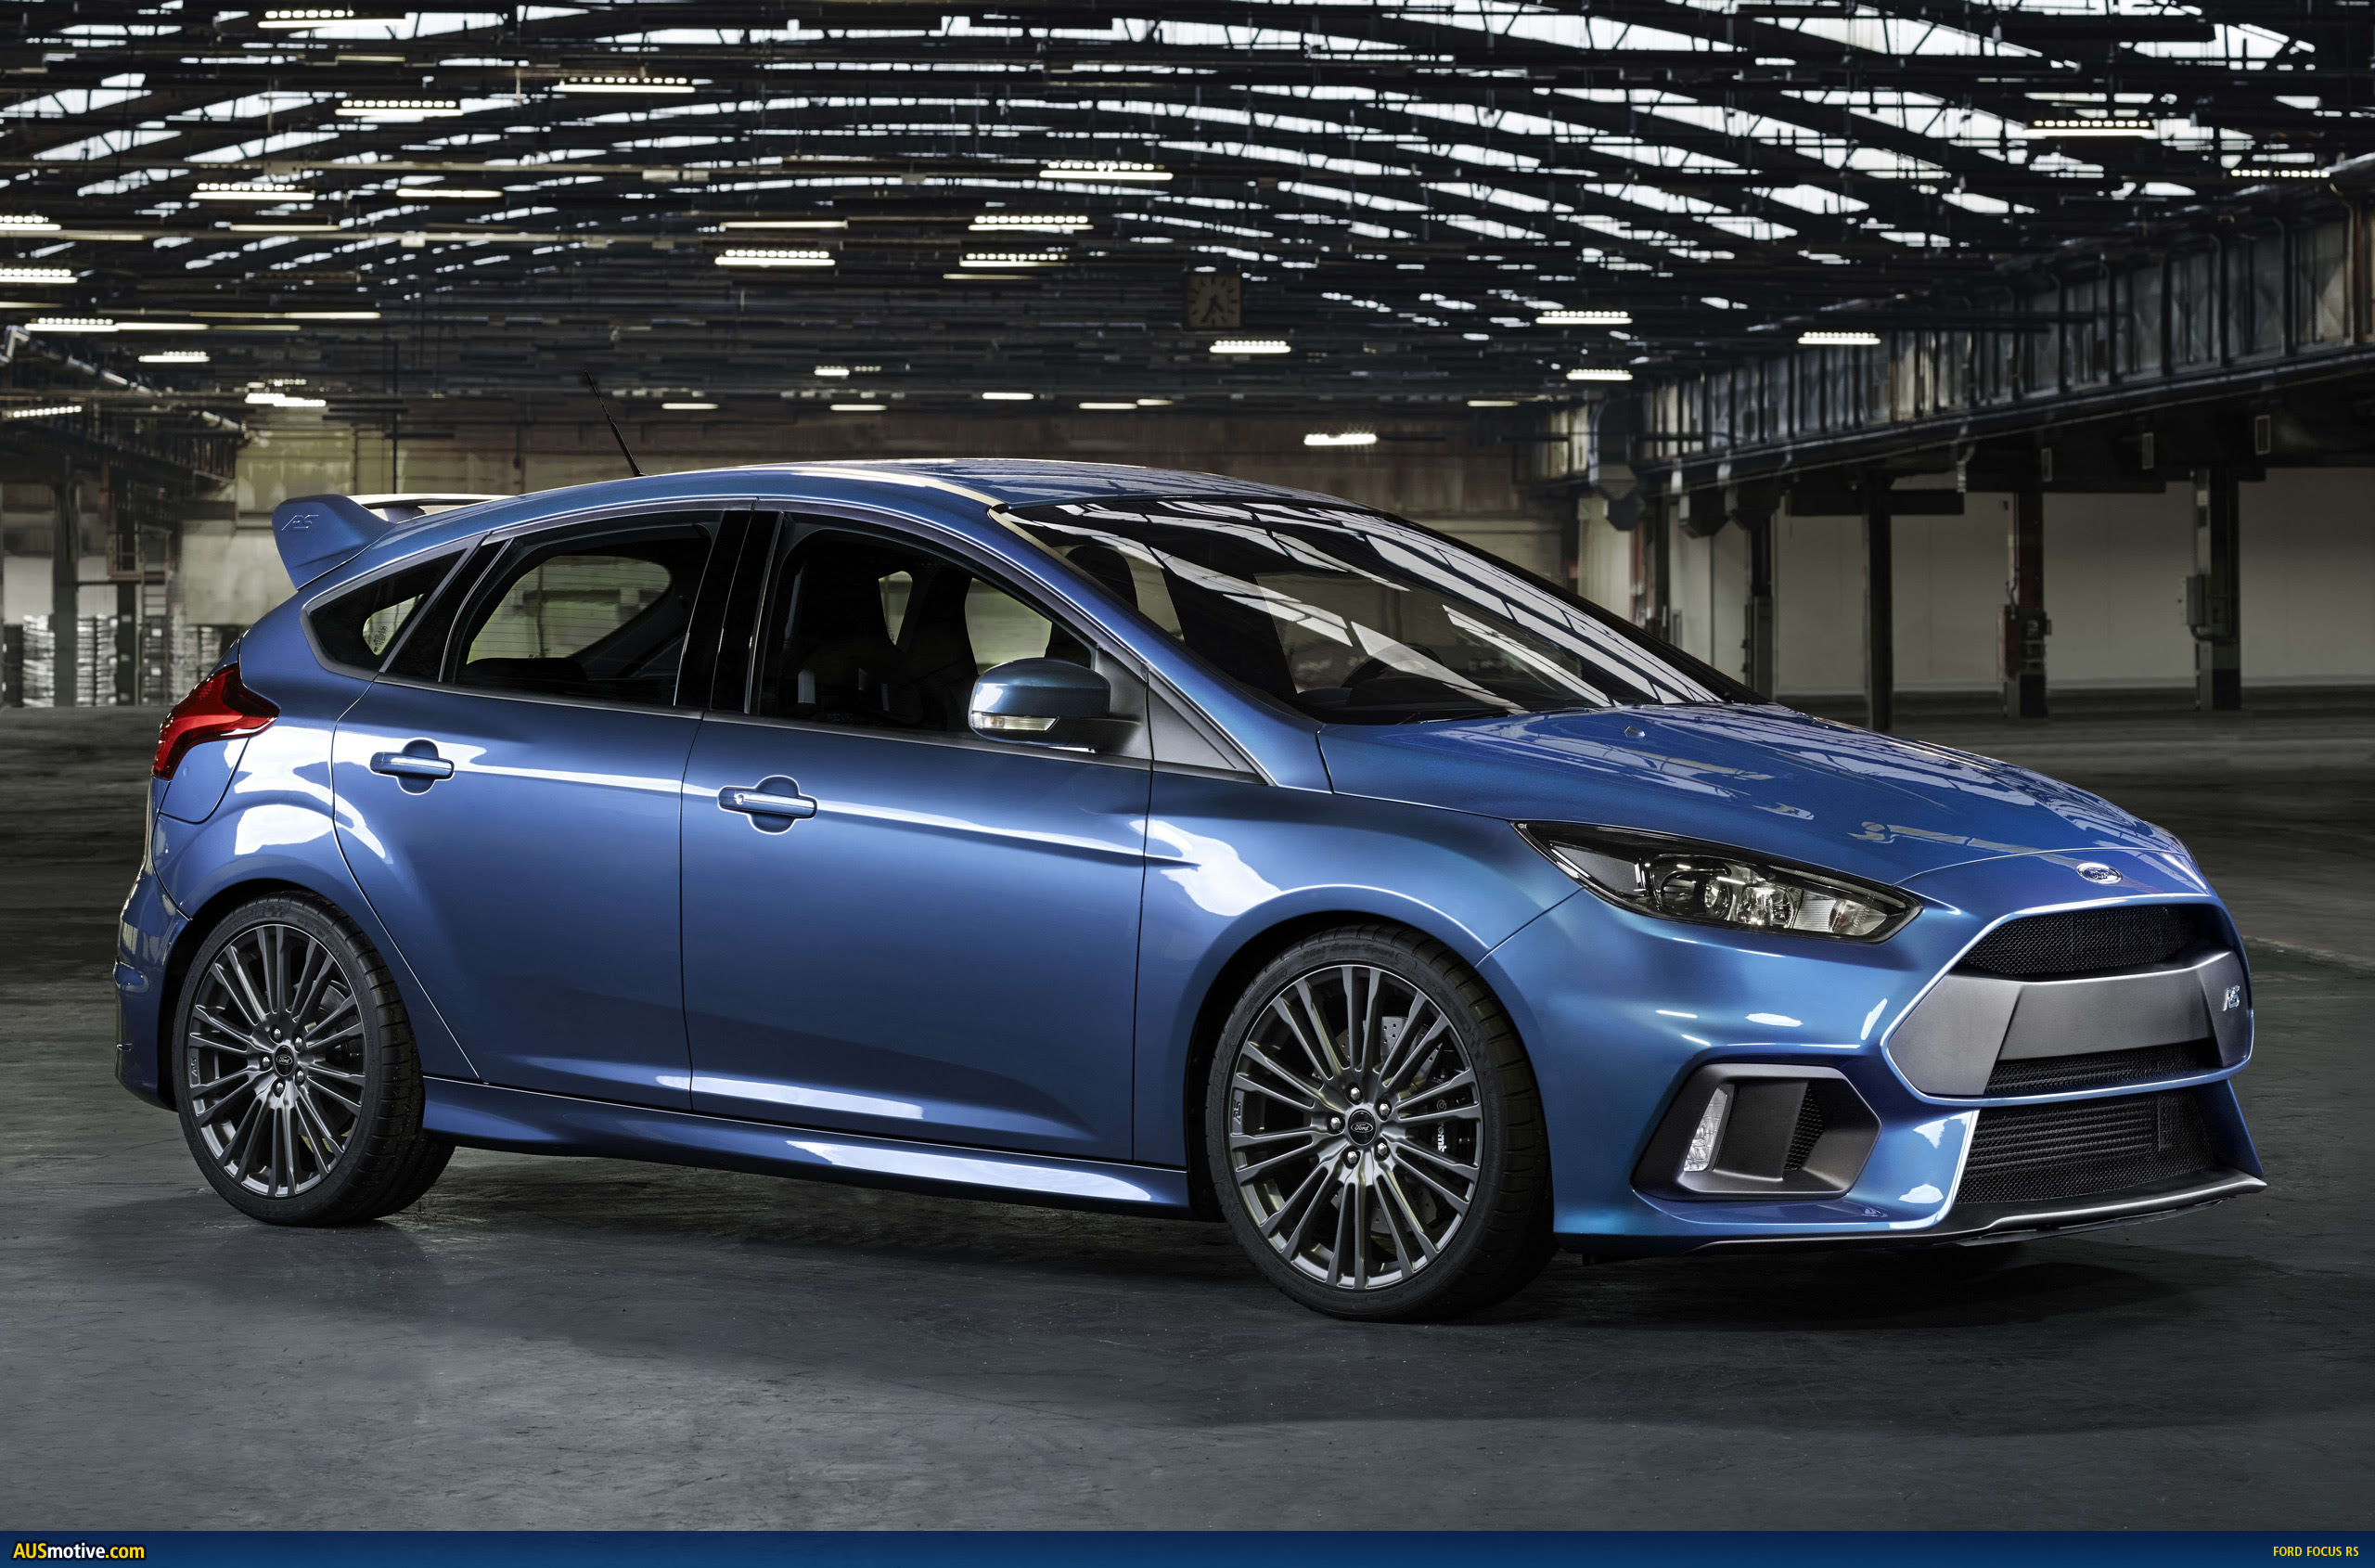 AUSmotive.com » 2016 Ford Focus RS previewed